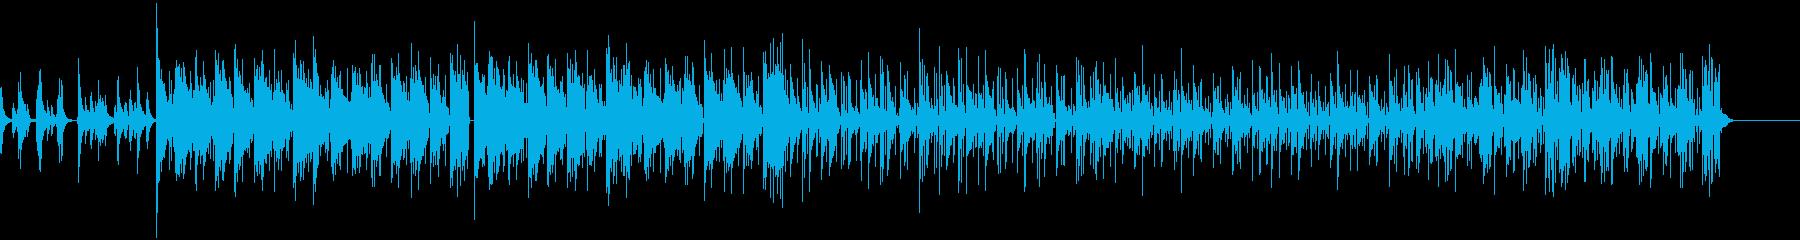 【LoFi Hiphop】深夜 チルの再生済みの波形